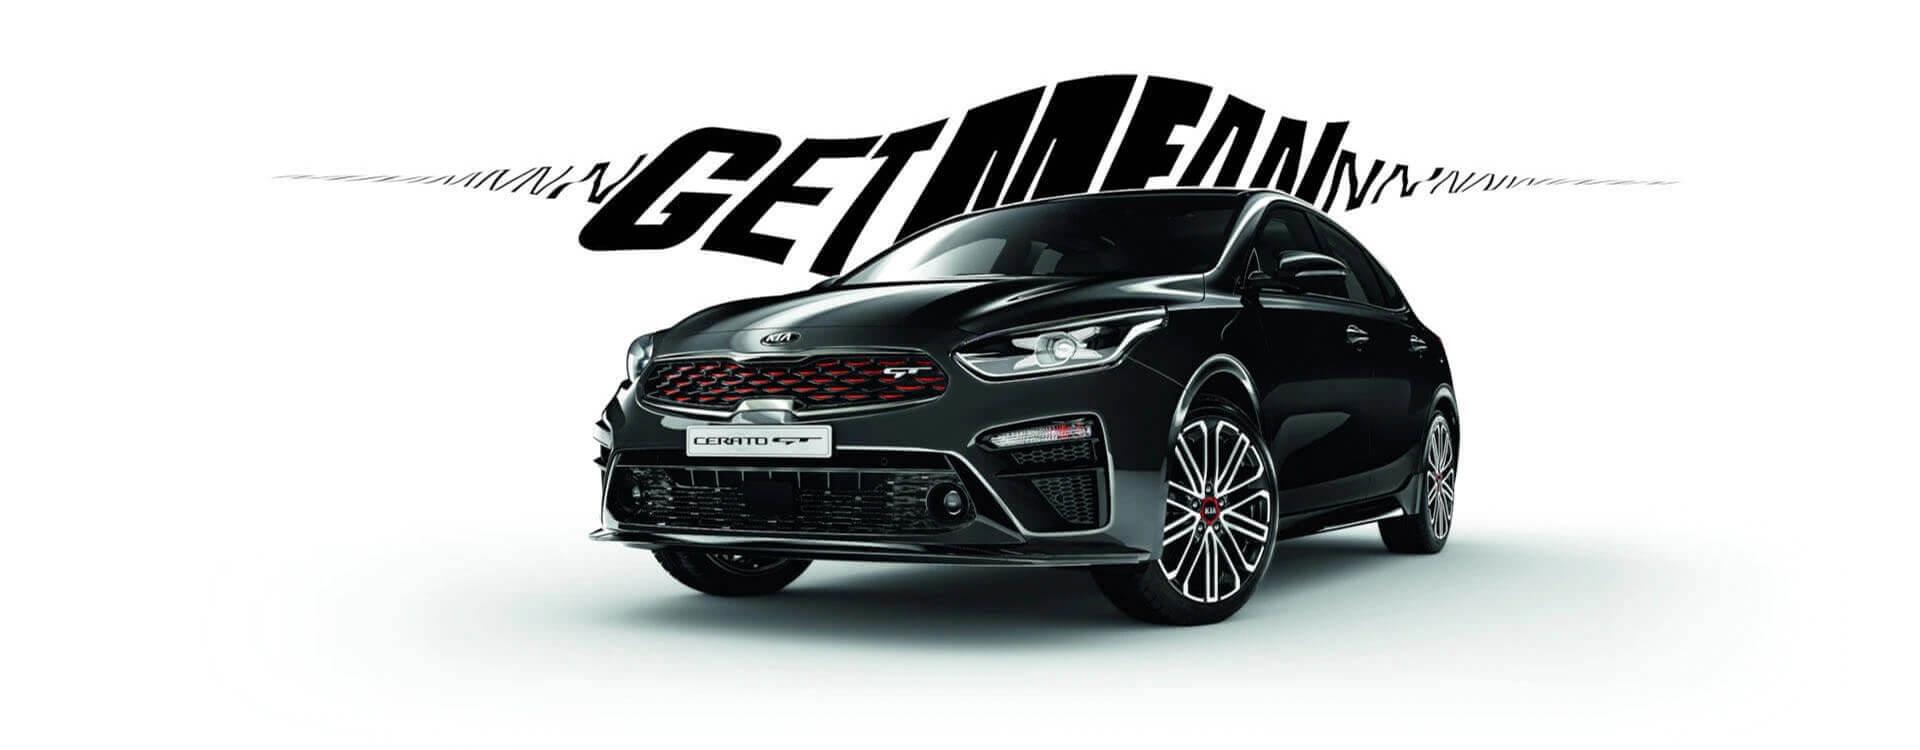 Kia Cerato Hatch Get Mean Design